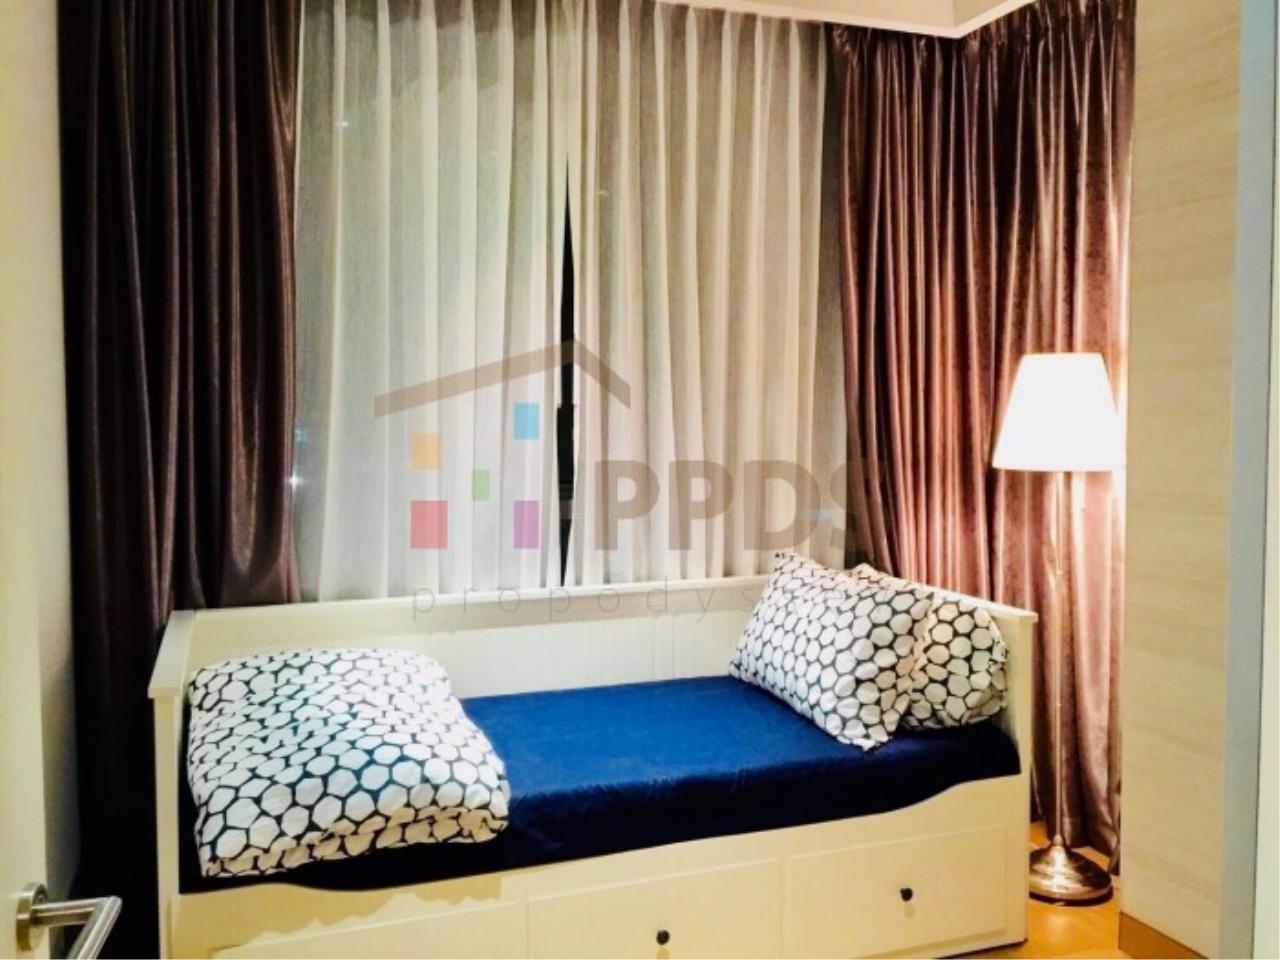 Propodyssey Agency's 2 bedrooms condo for rent Sukhumvit soi 24 called Lumpini 24 close to K-Village 9